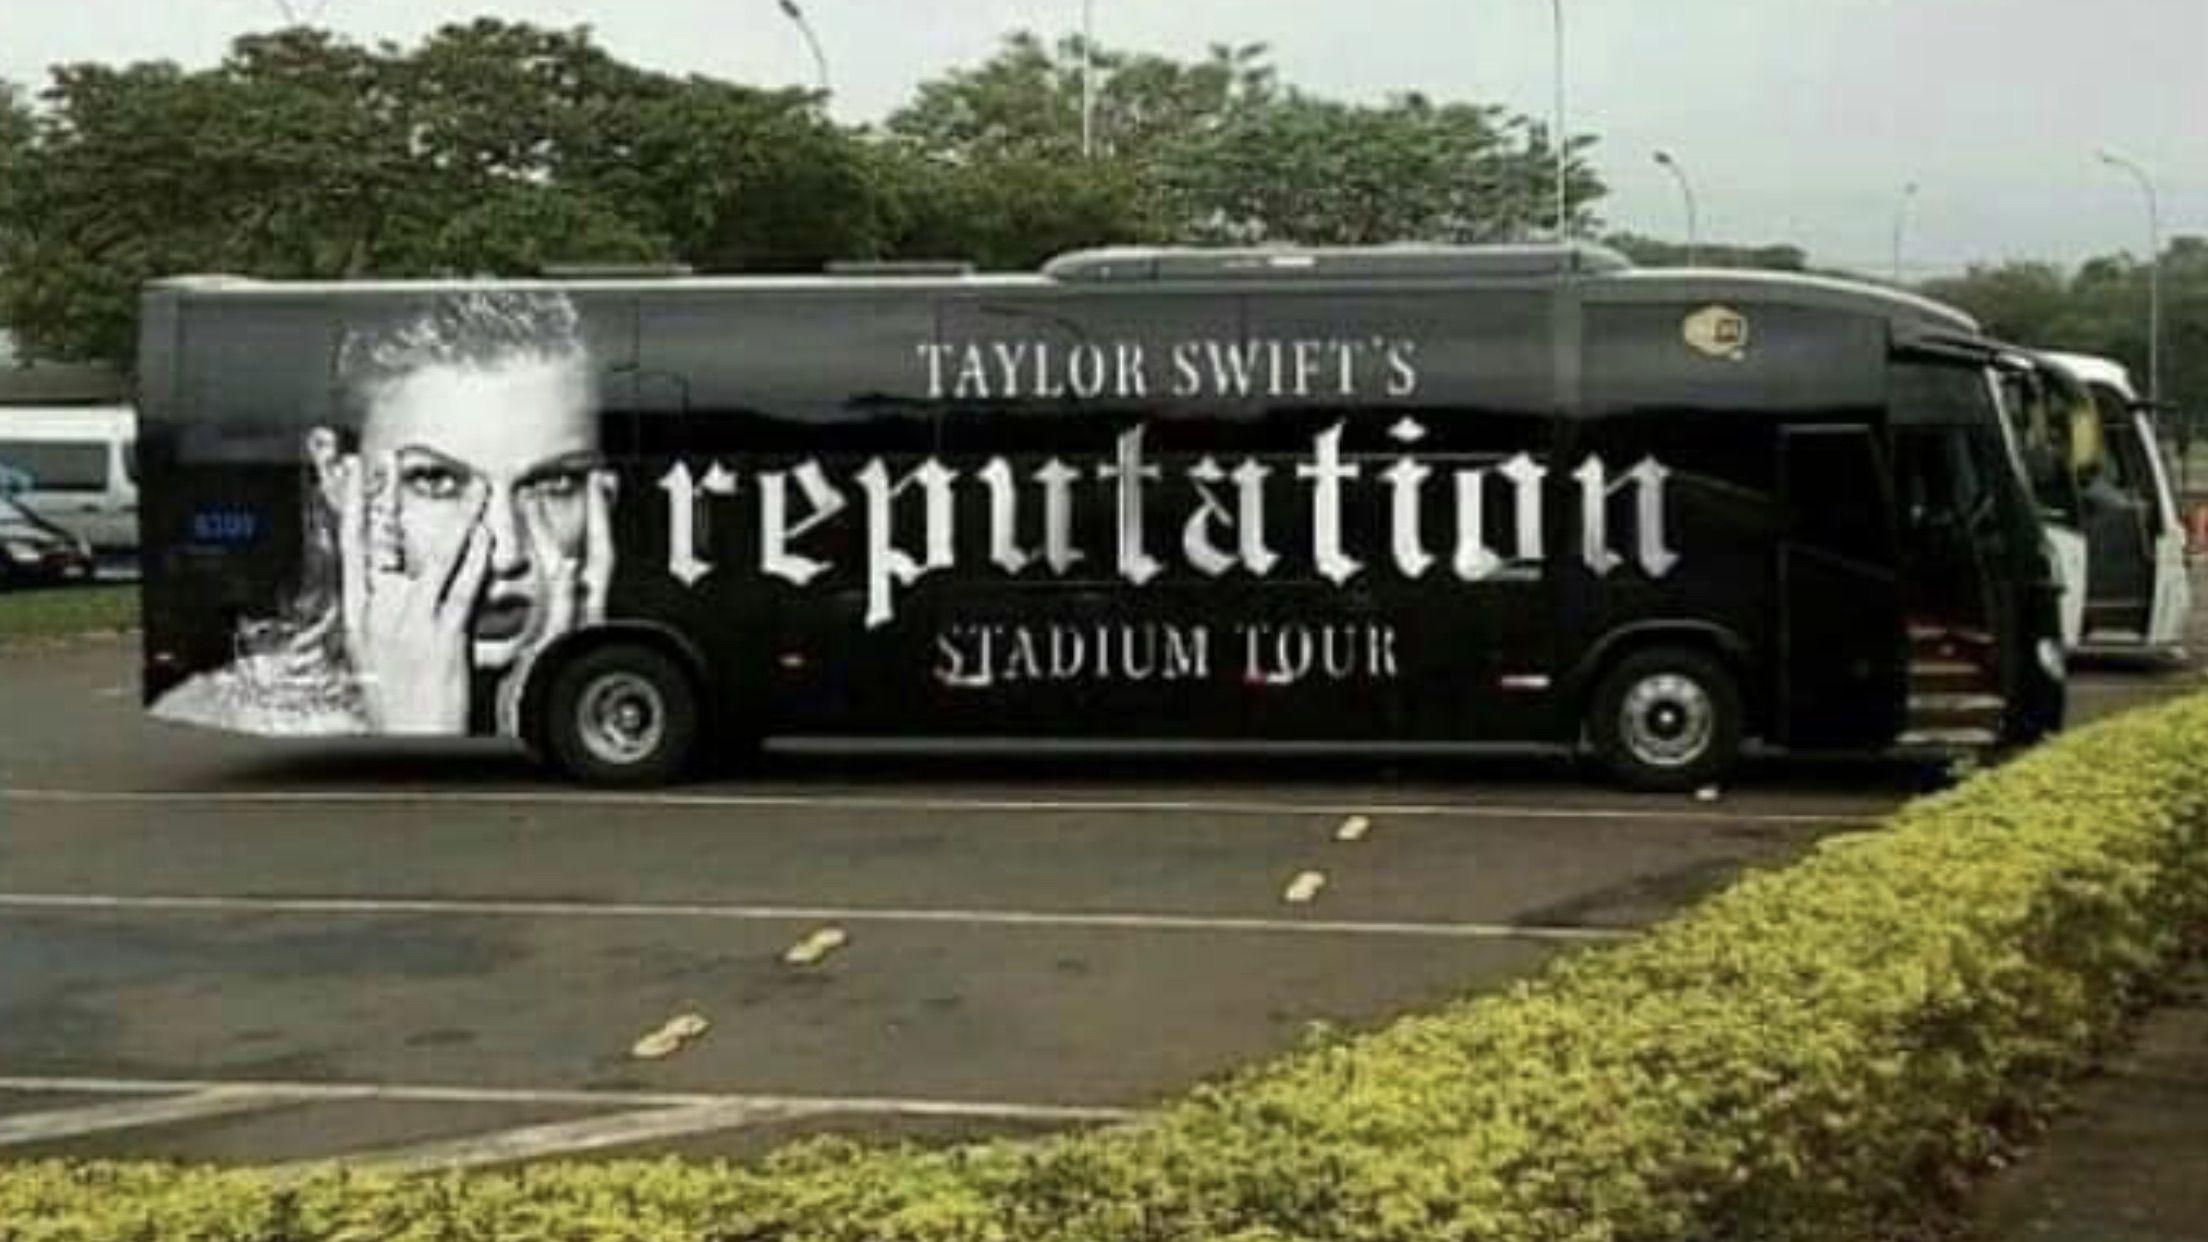 reputation stadium tour bus taylor swift 2018 music